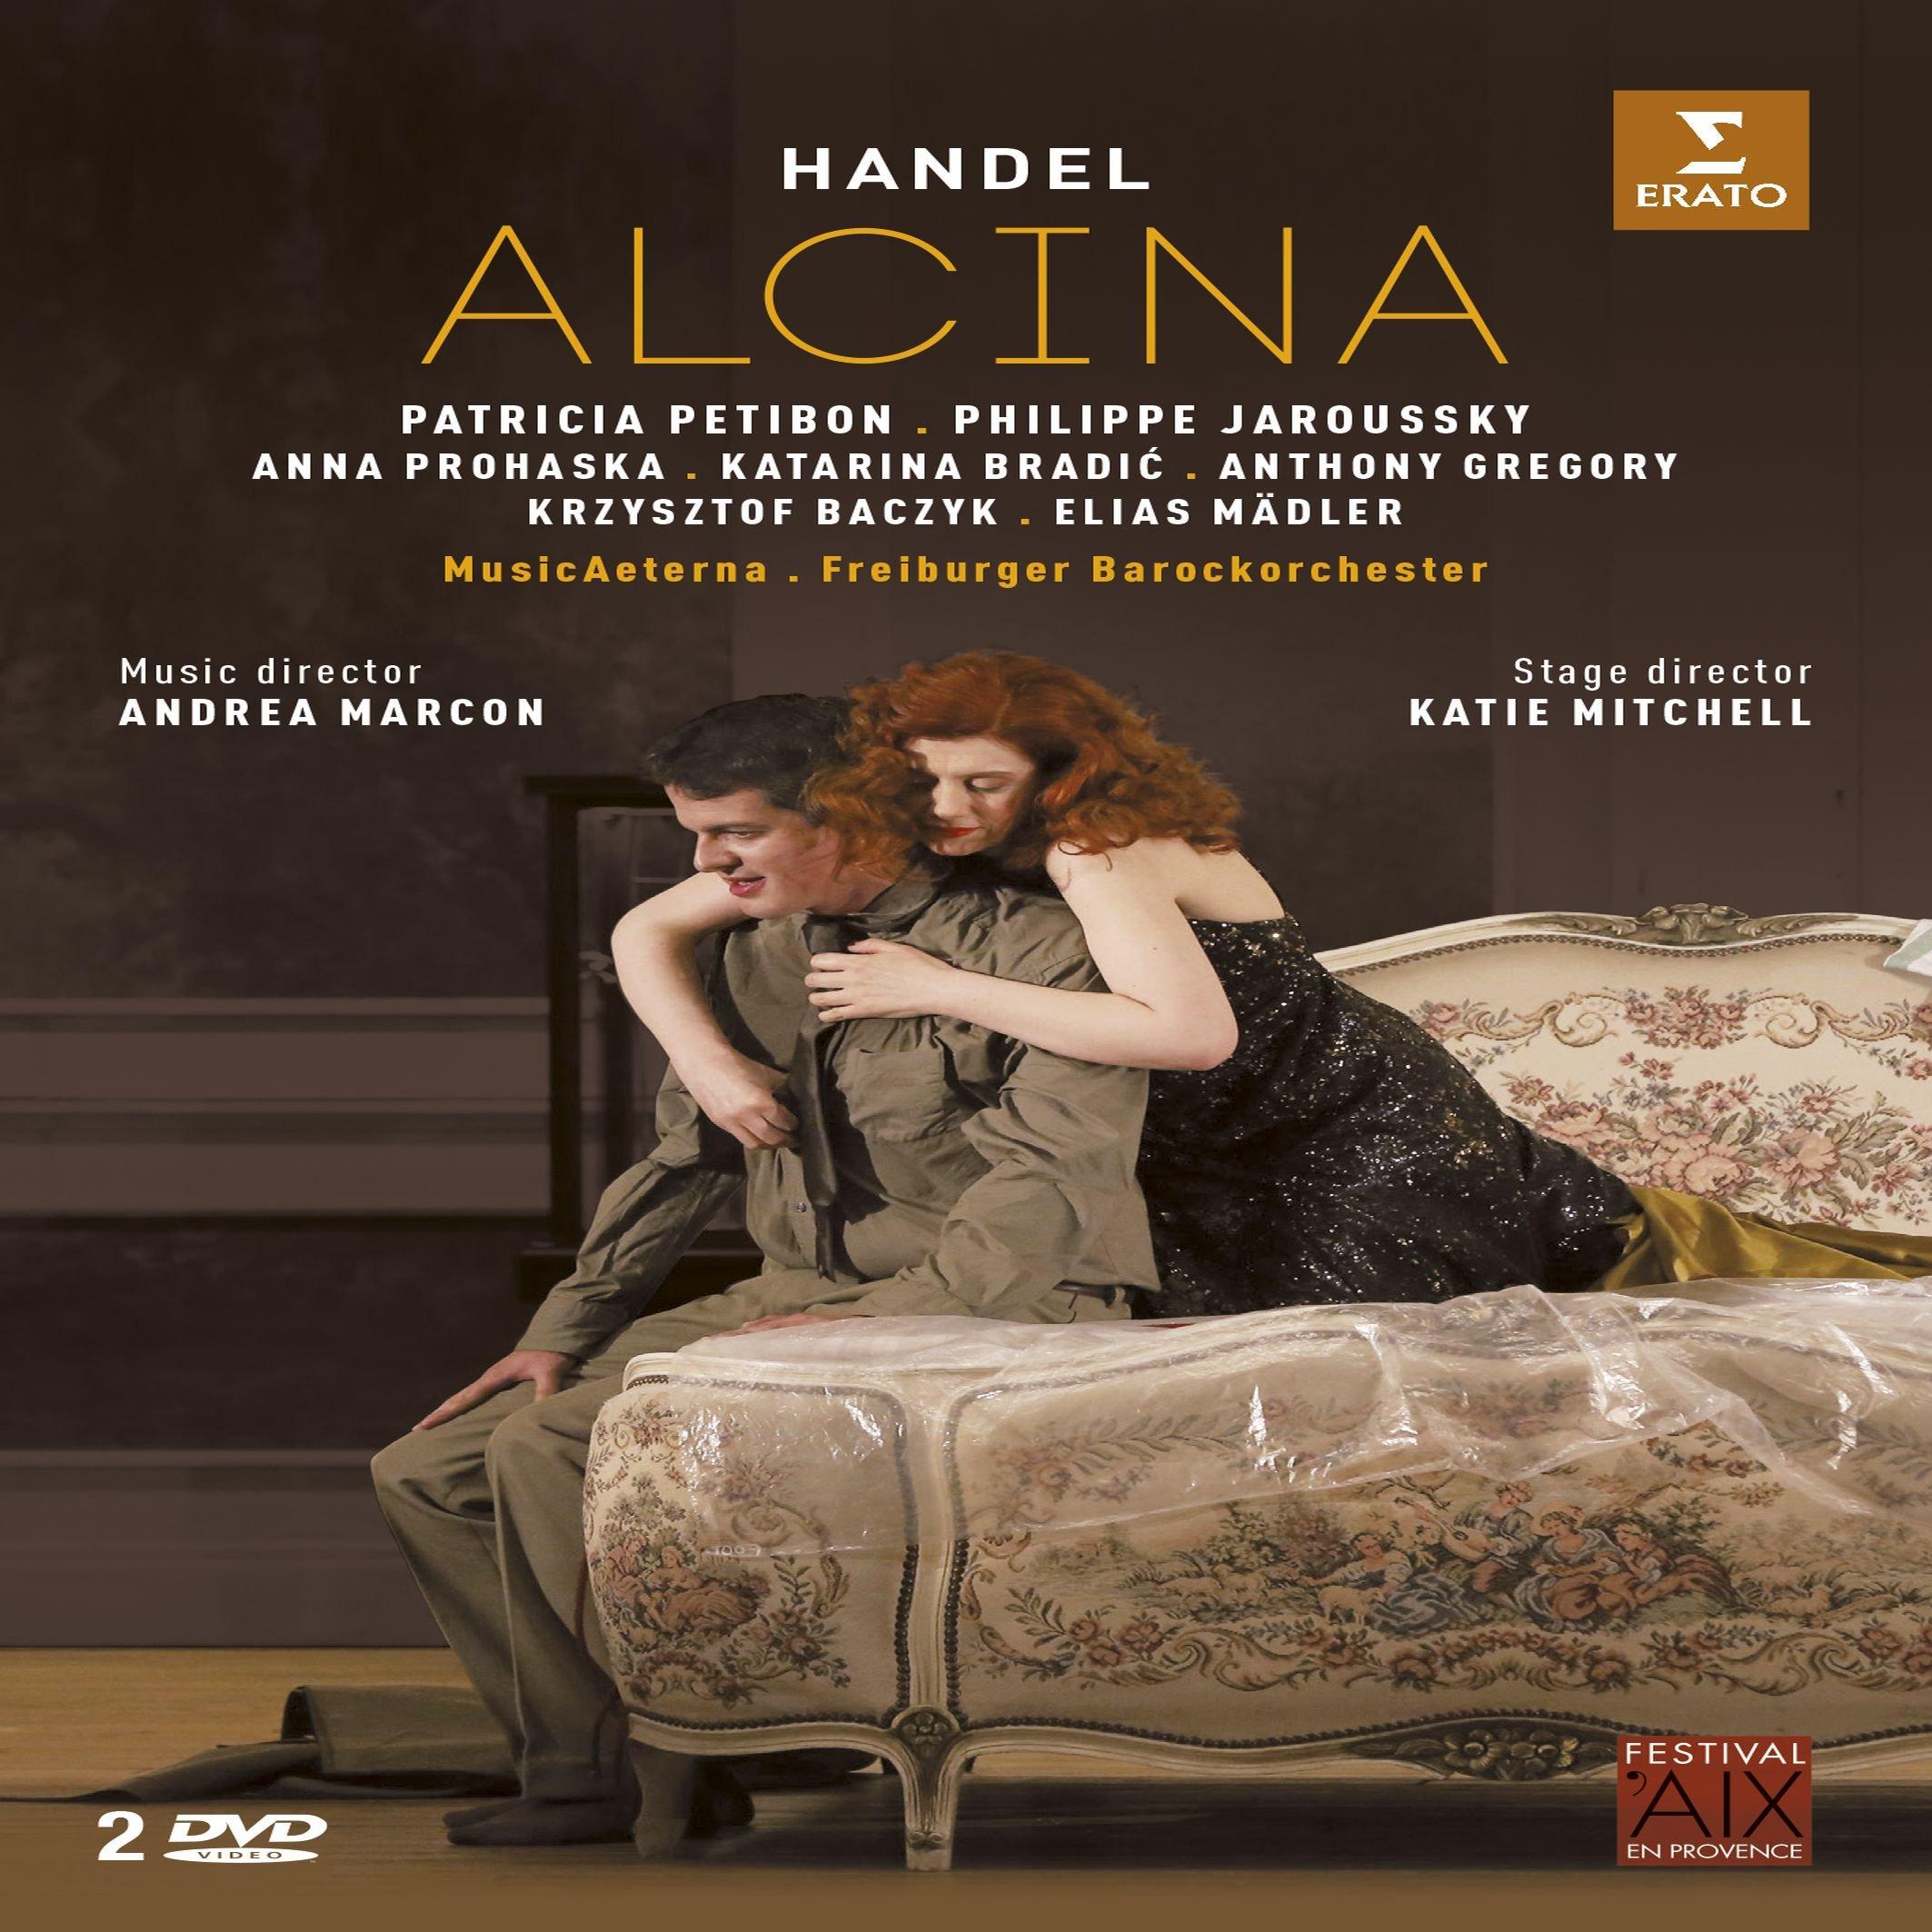 DVD : Philippe Jaroussky - Alcina (aix En Provence) (DVD)